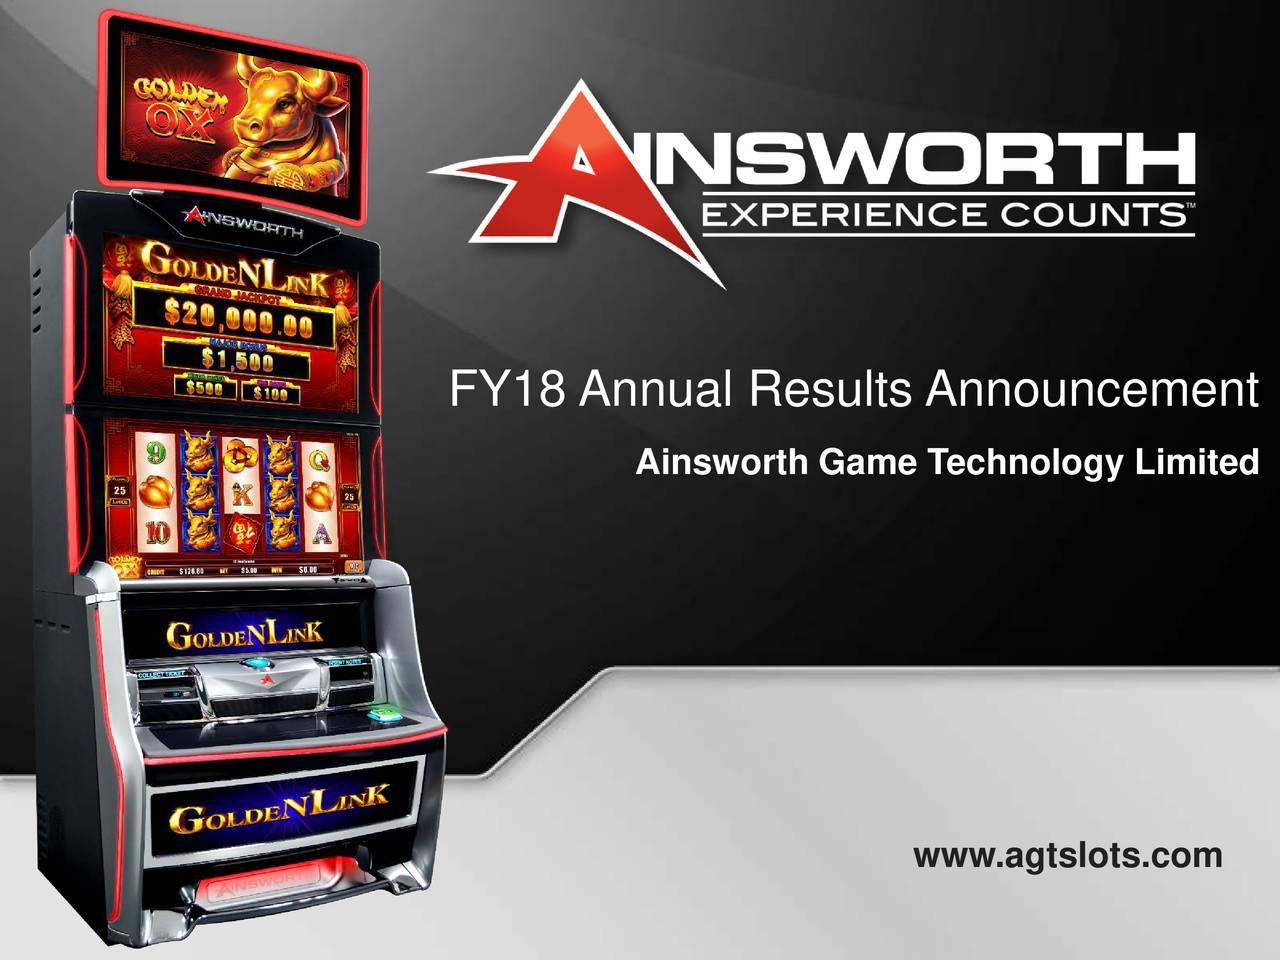 Ainsworth Game Technology Ltd